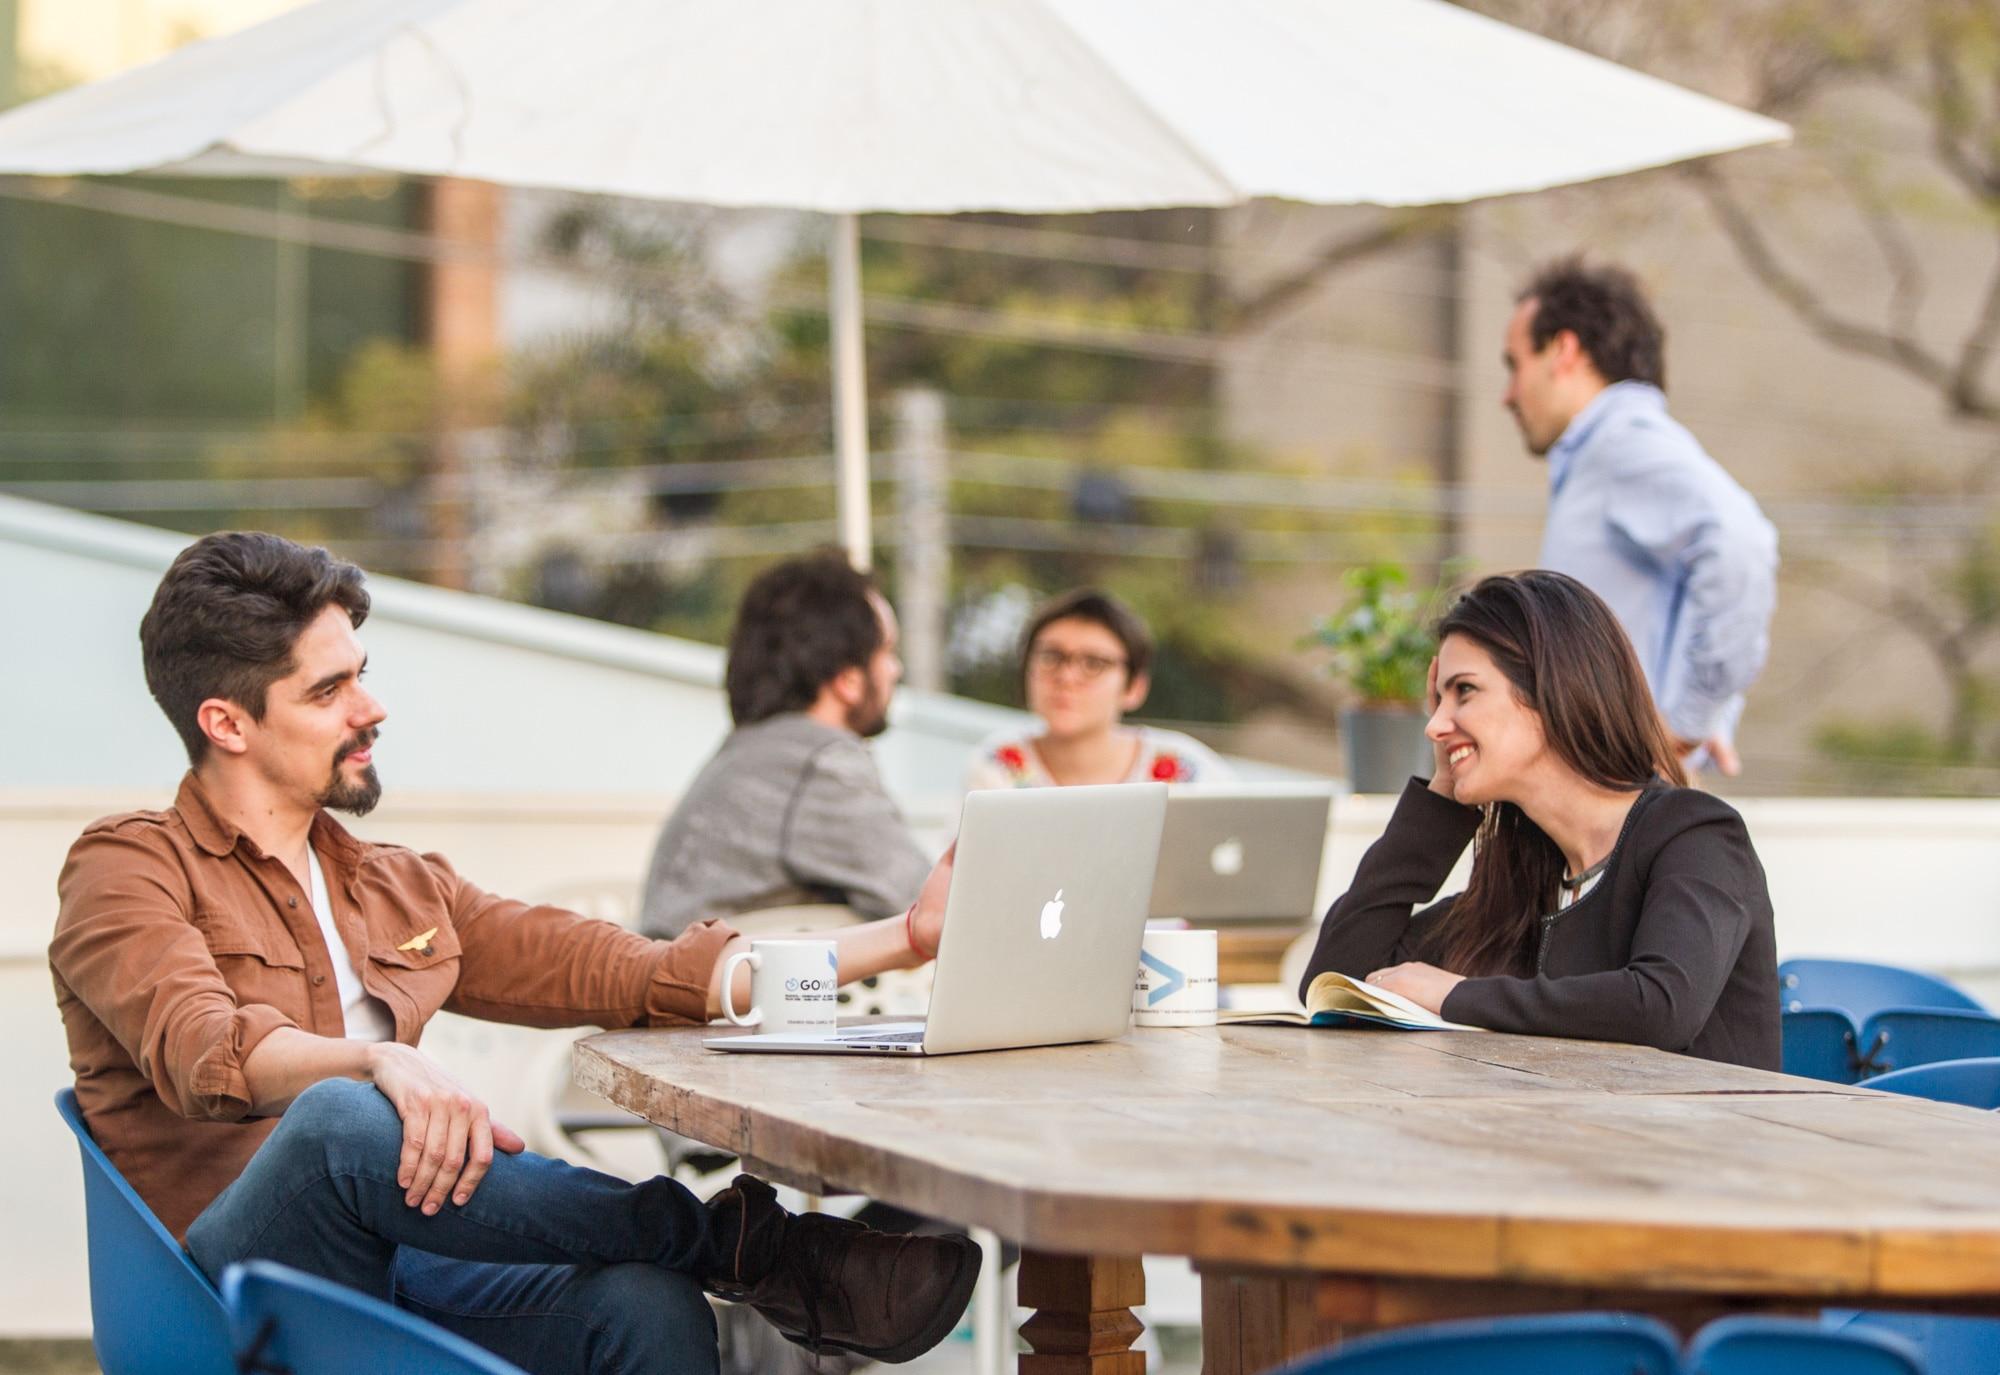 Laboratório-de-empreendedorismo-Coworking-SP